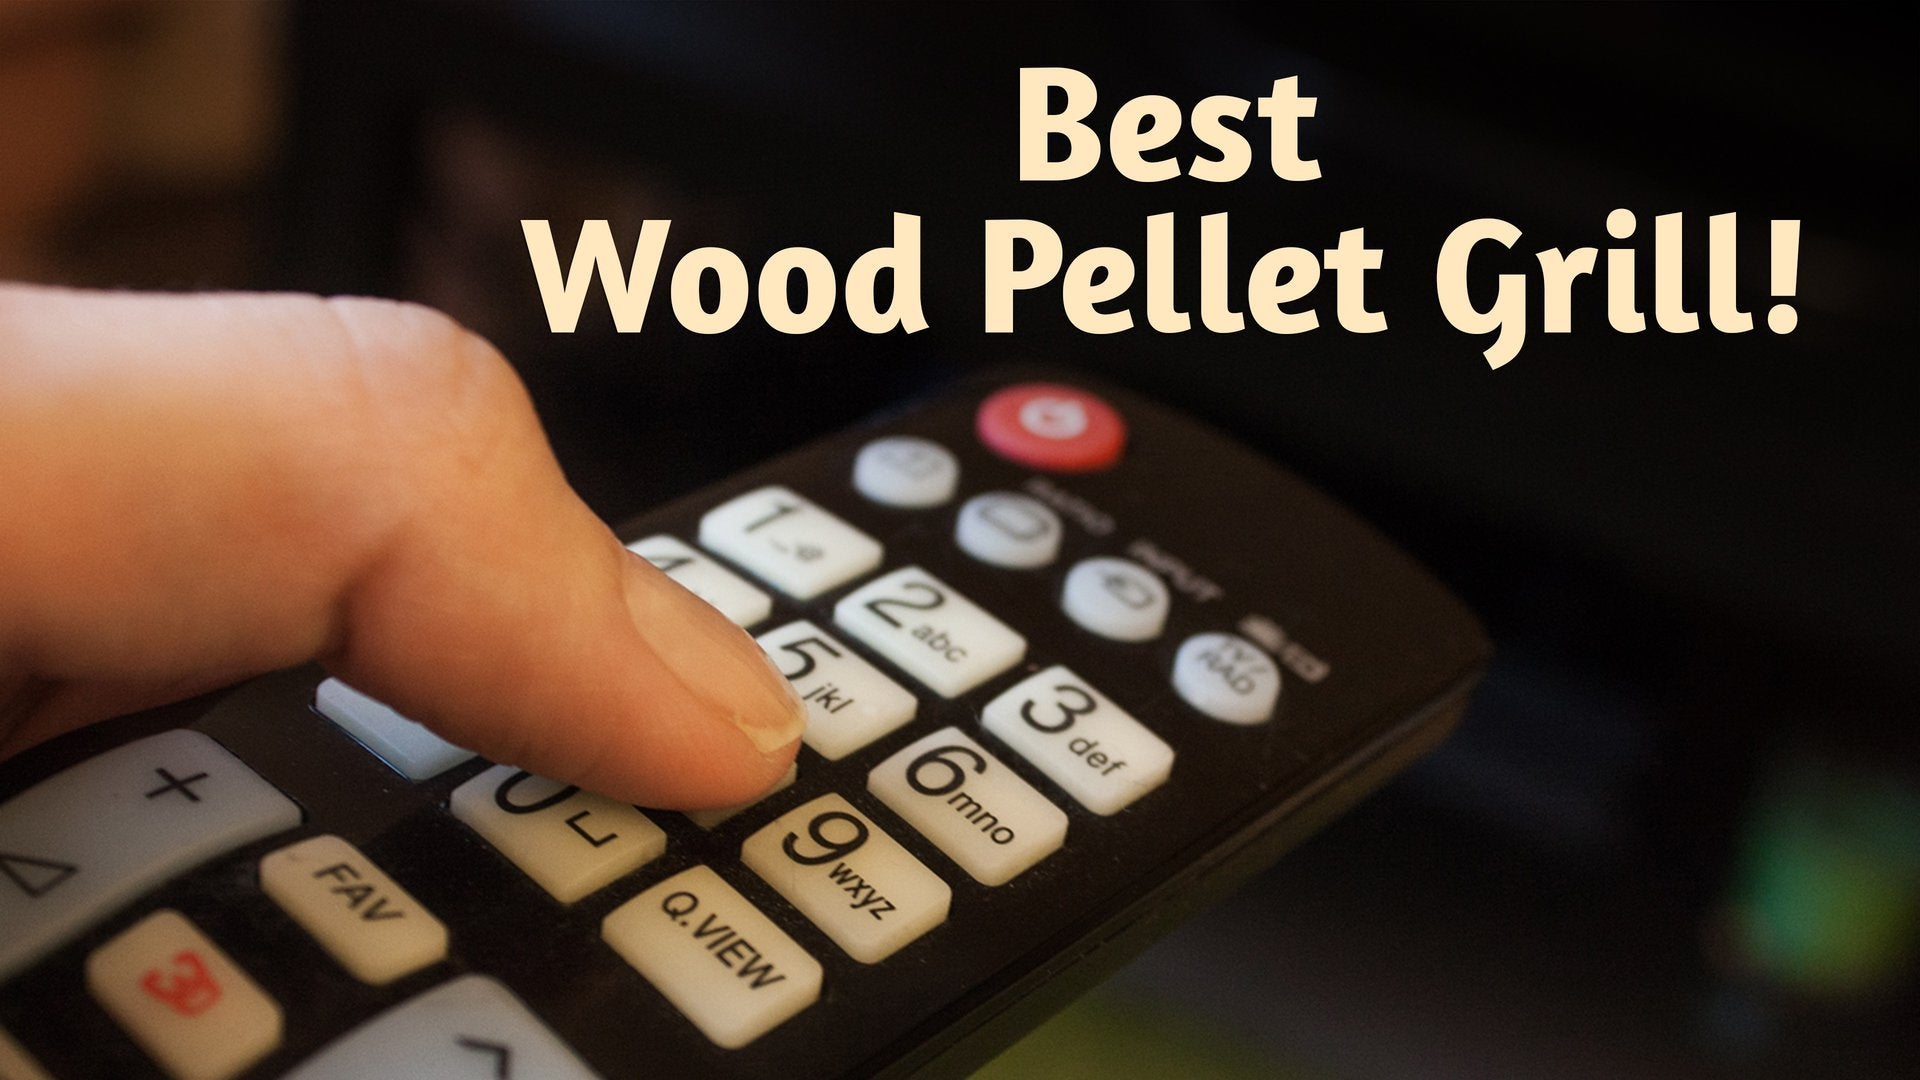 Best Wood Pellet Grill!